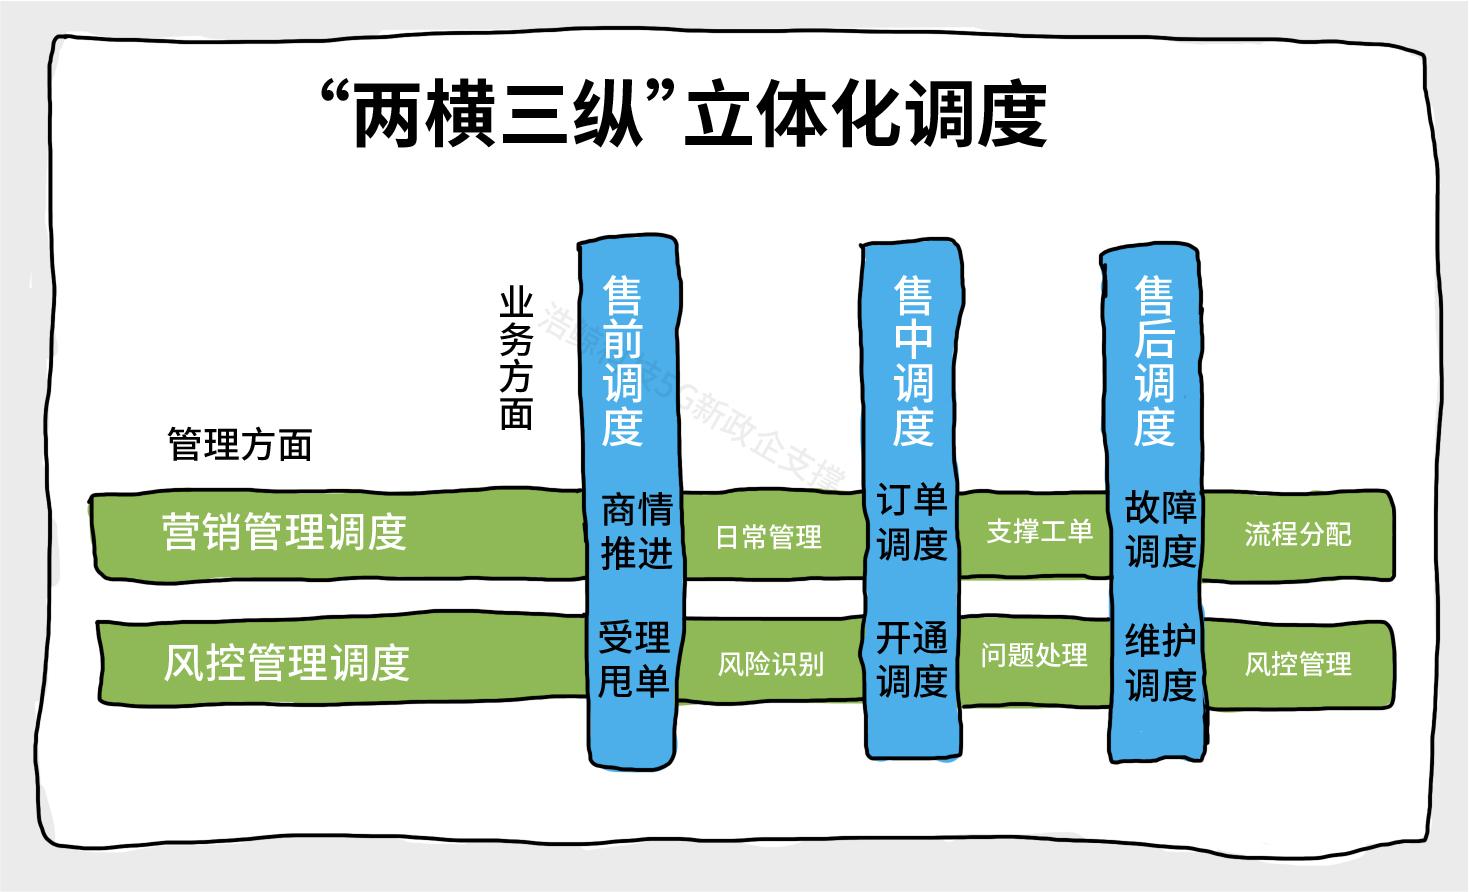 C:\Users\wang-han\Desktop\2.jpg